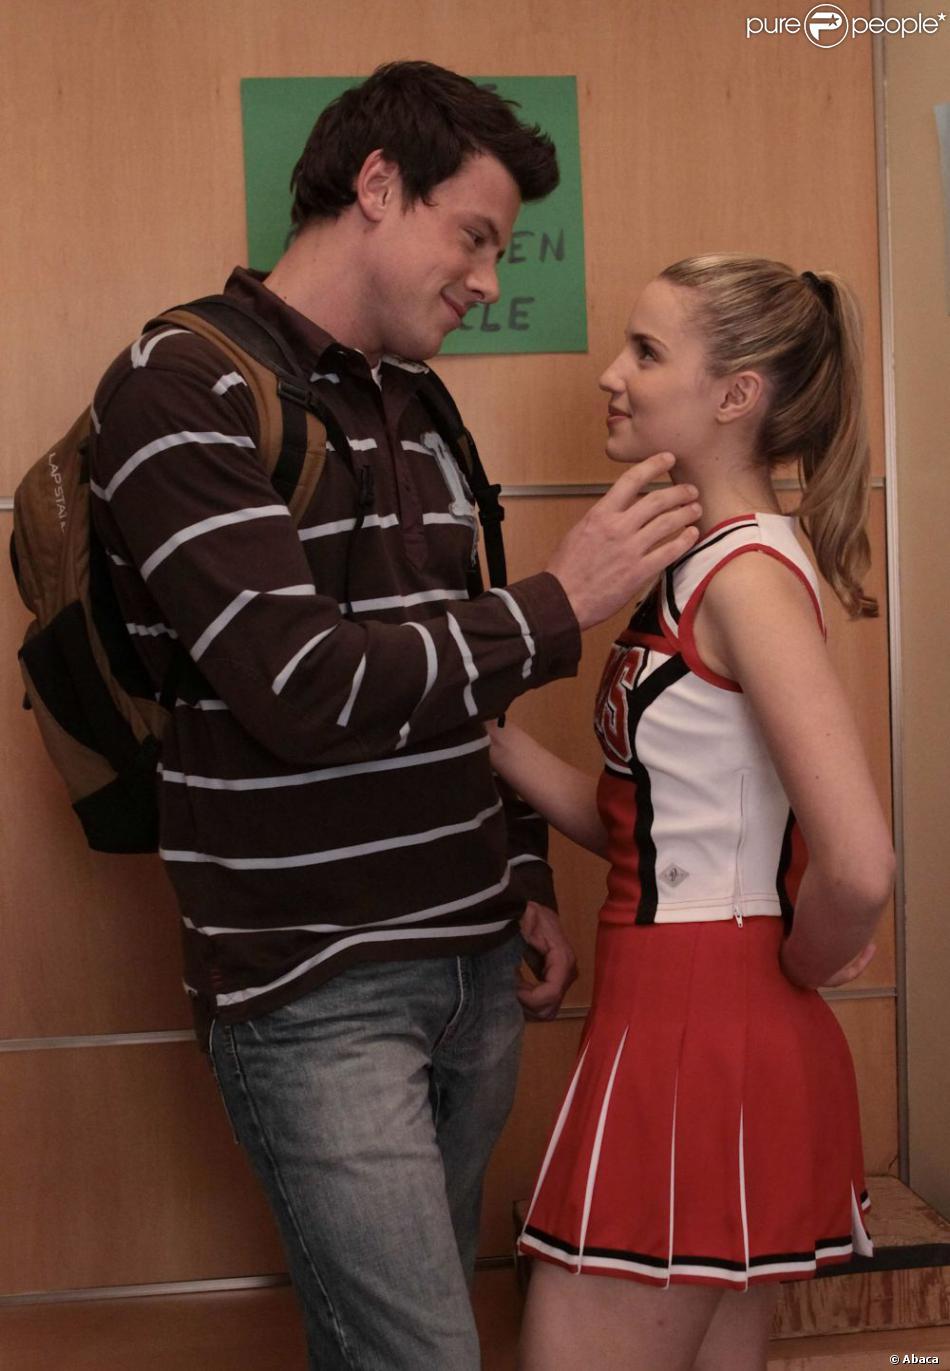 1185606--glee-season-1-2009-2010-dianna-950x0-1 jpgDianna Agron Glee Season 1